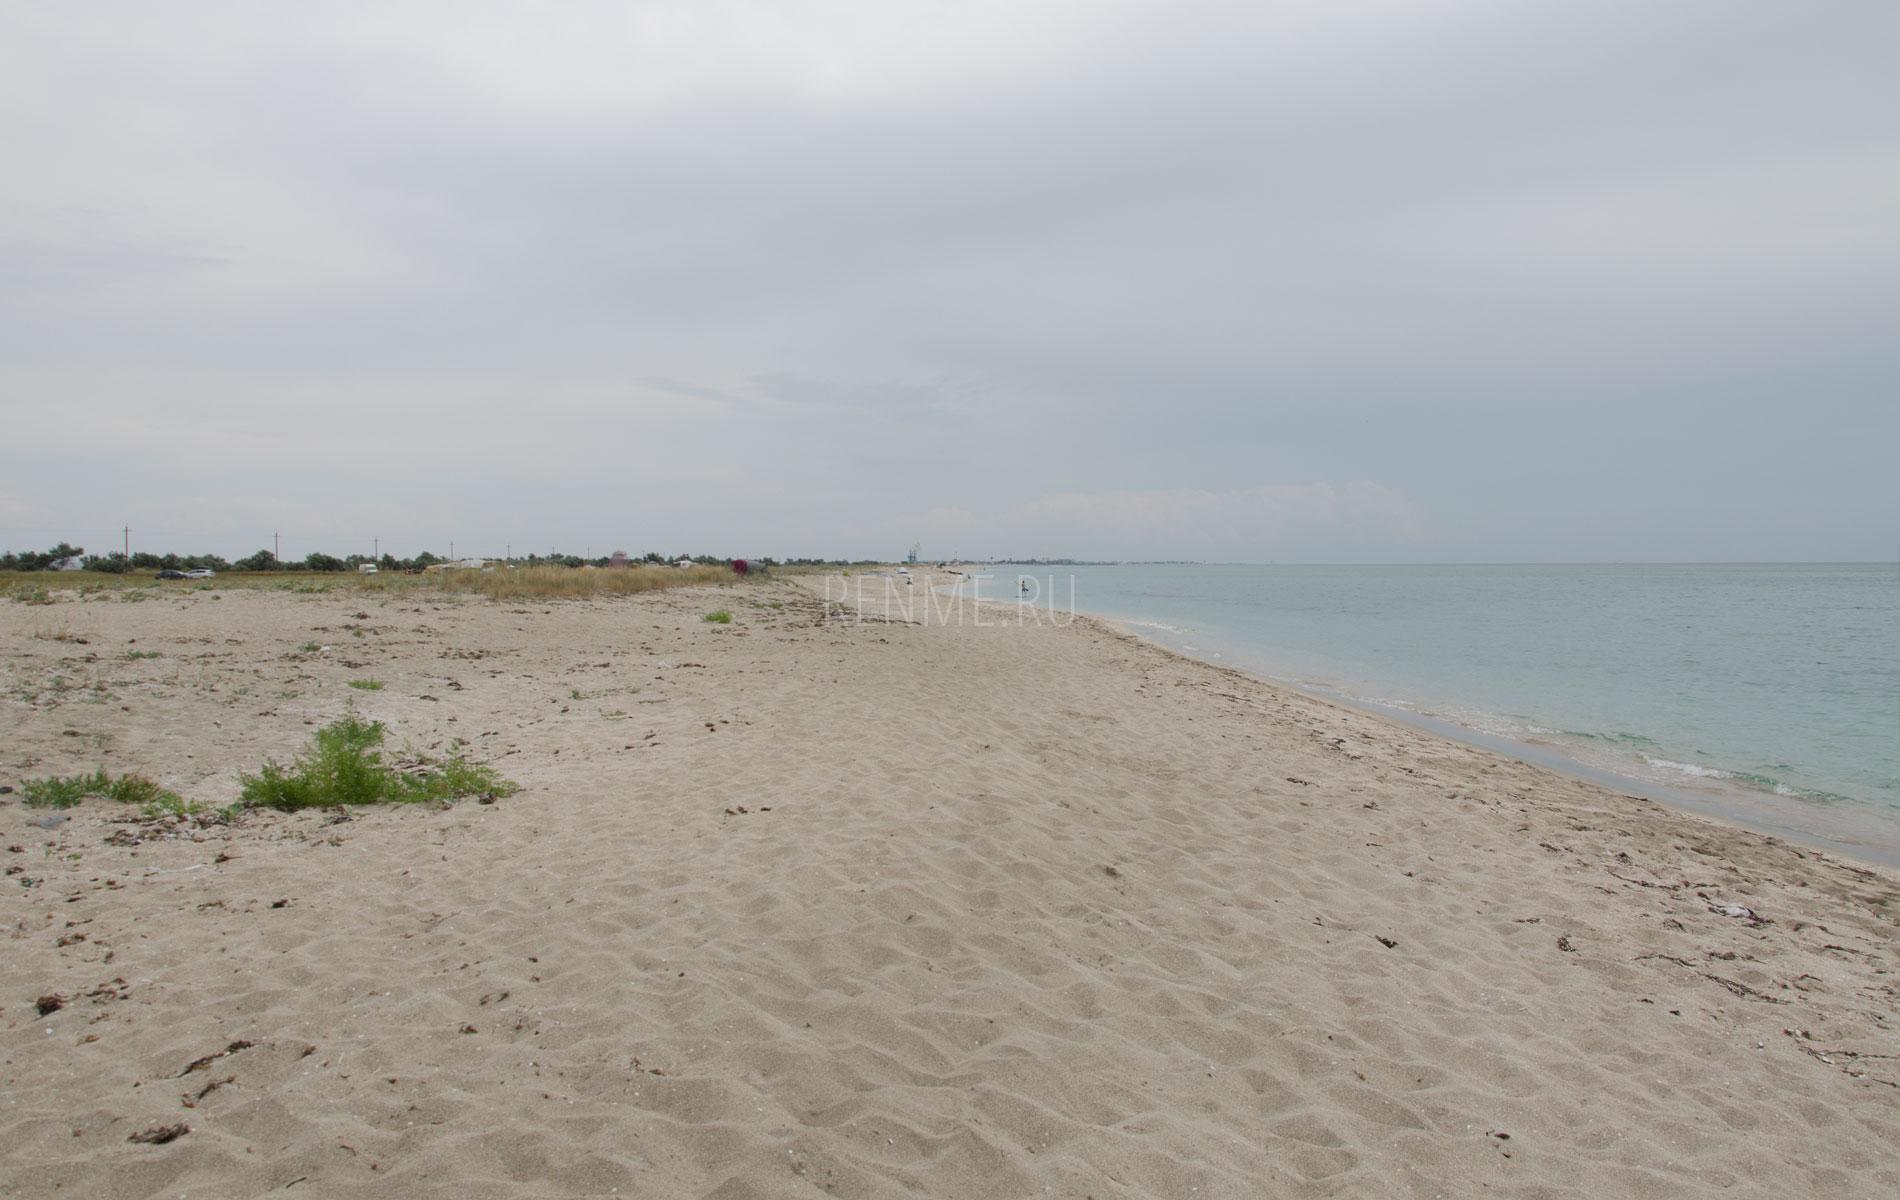 Пляж Беляус и августе 2019. Фото Мирного